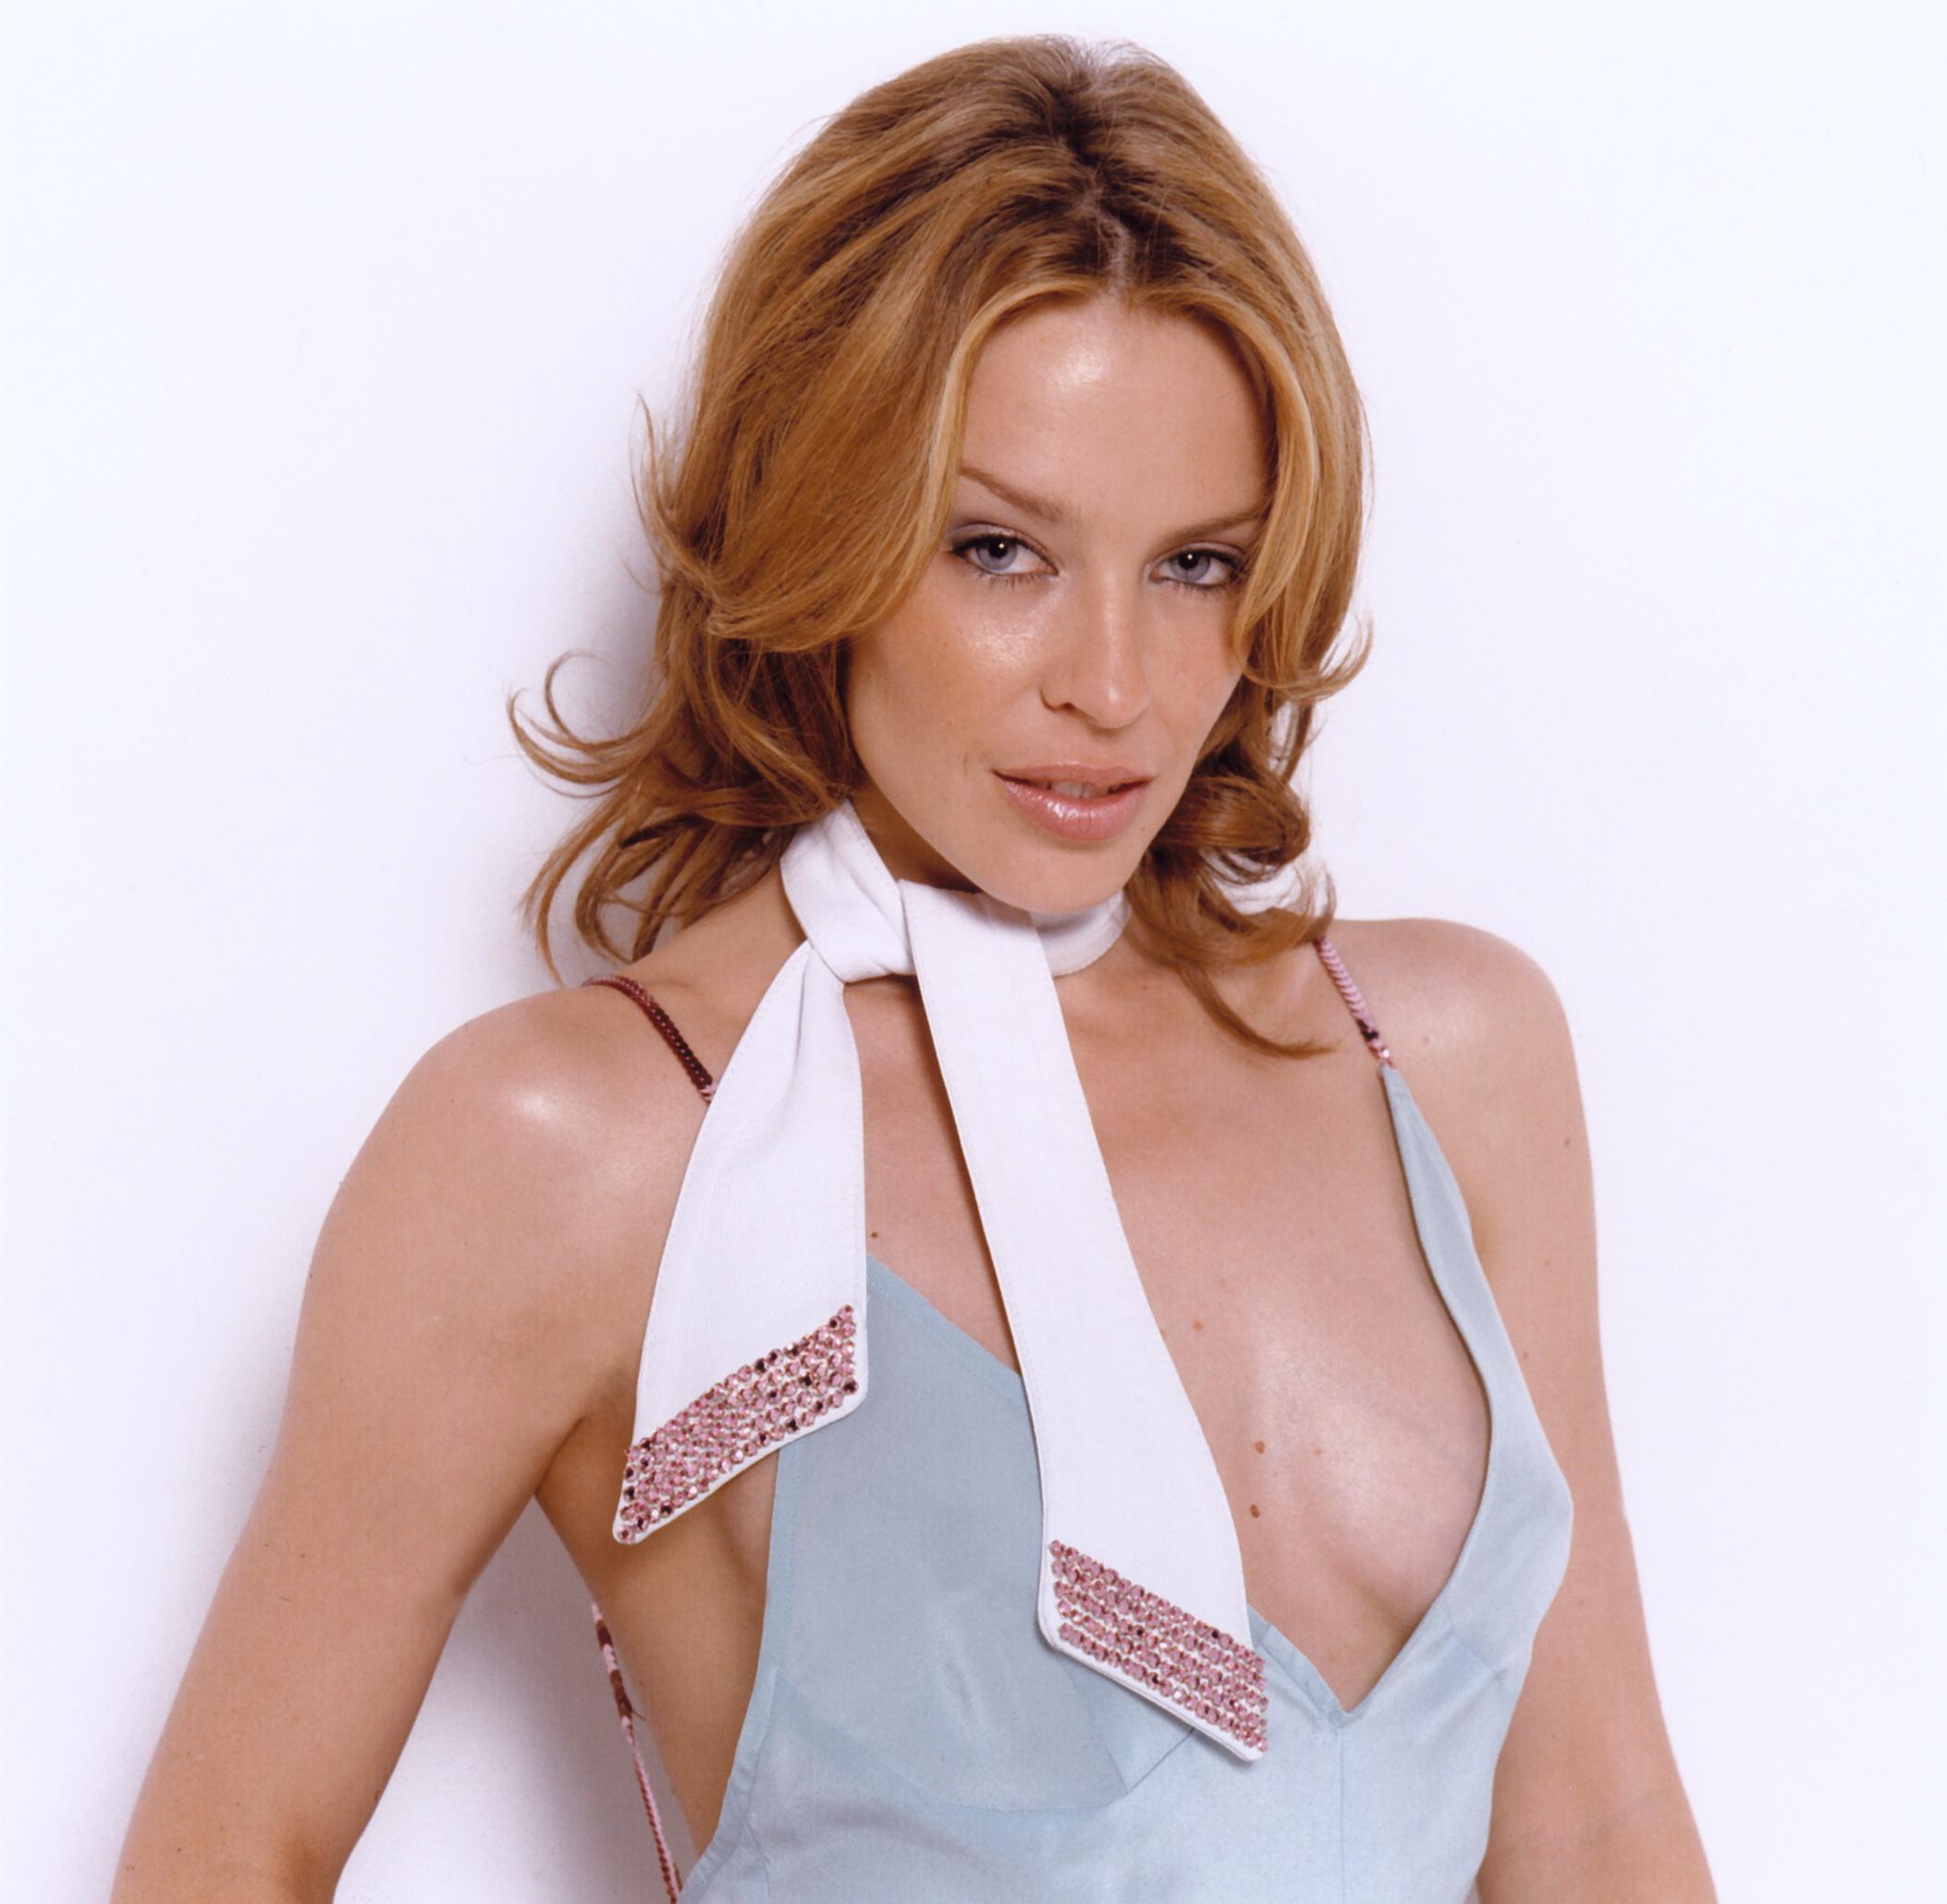 Kyllie Minogue Backgrounds, Compatible - PC, Mobile, Gadgets| 2106x2059 px